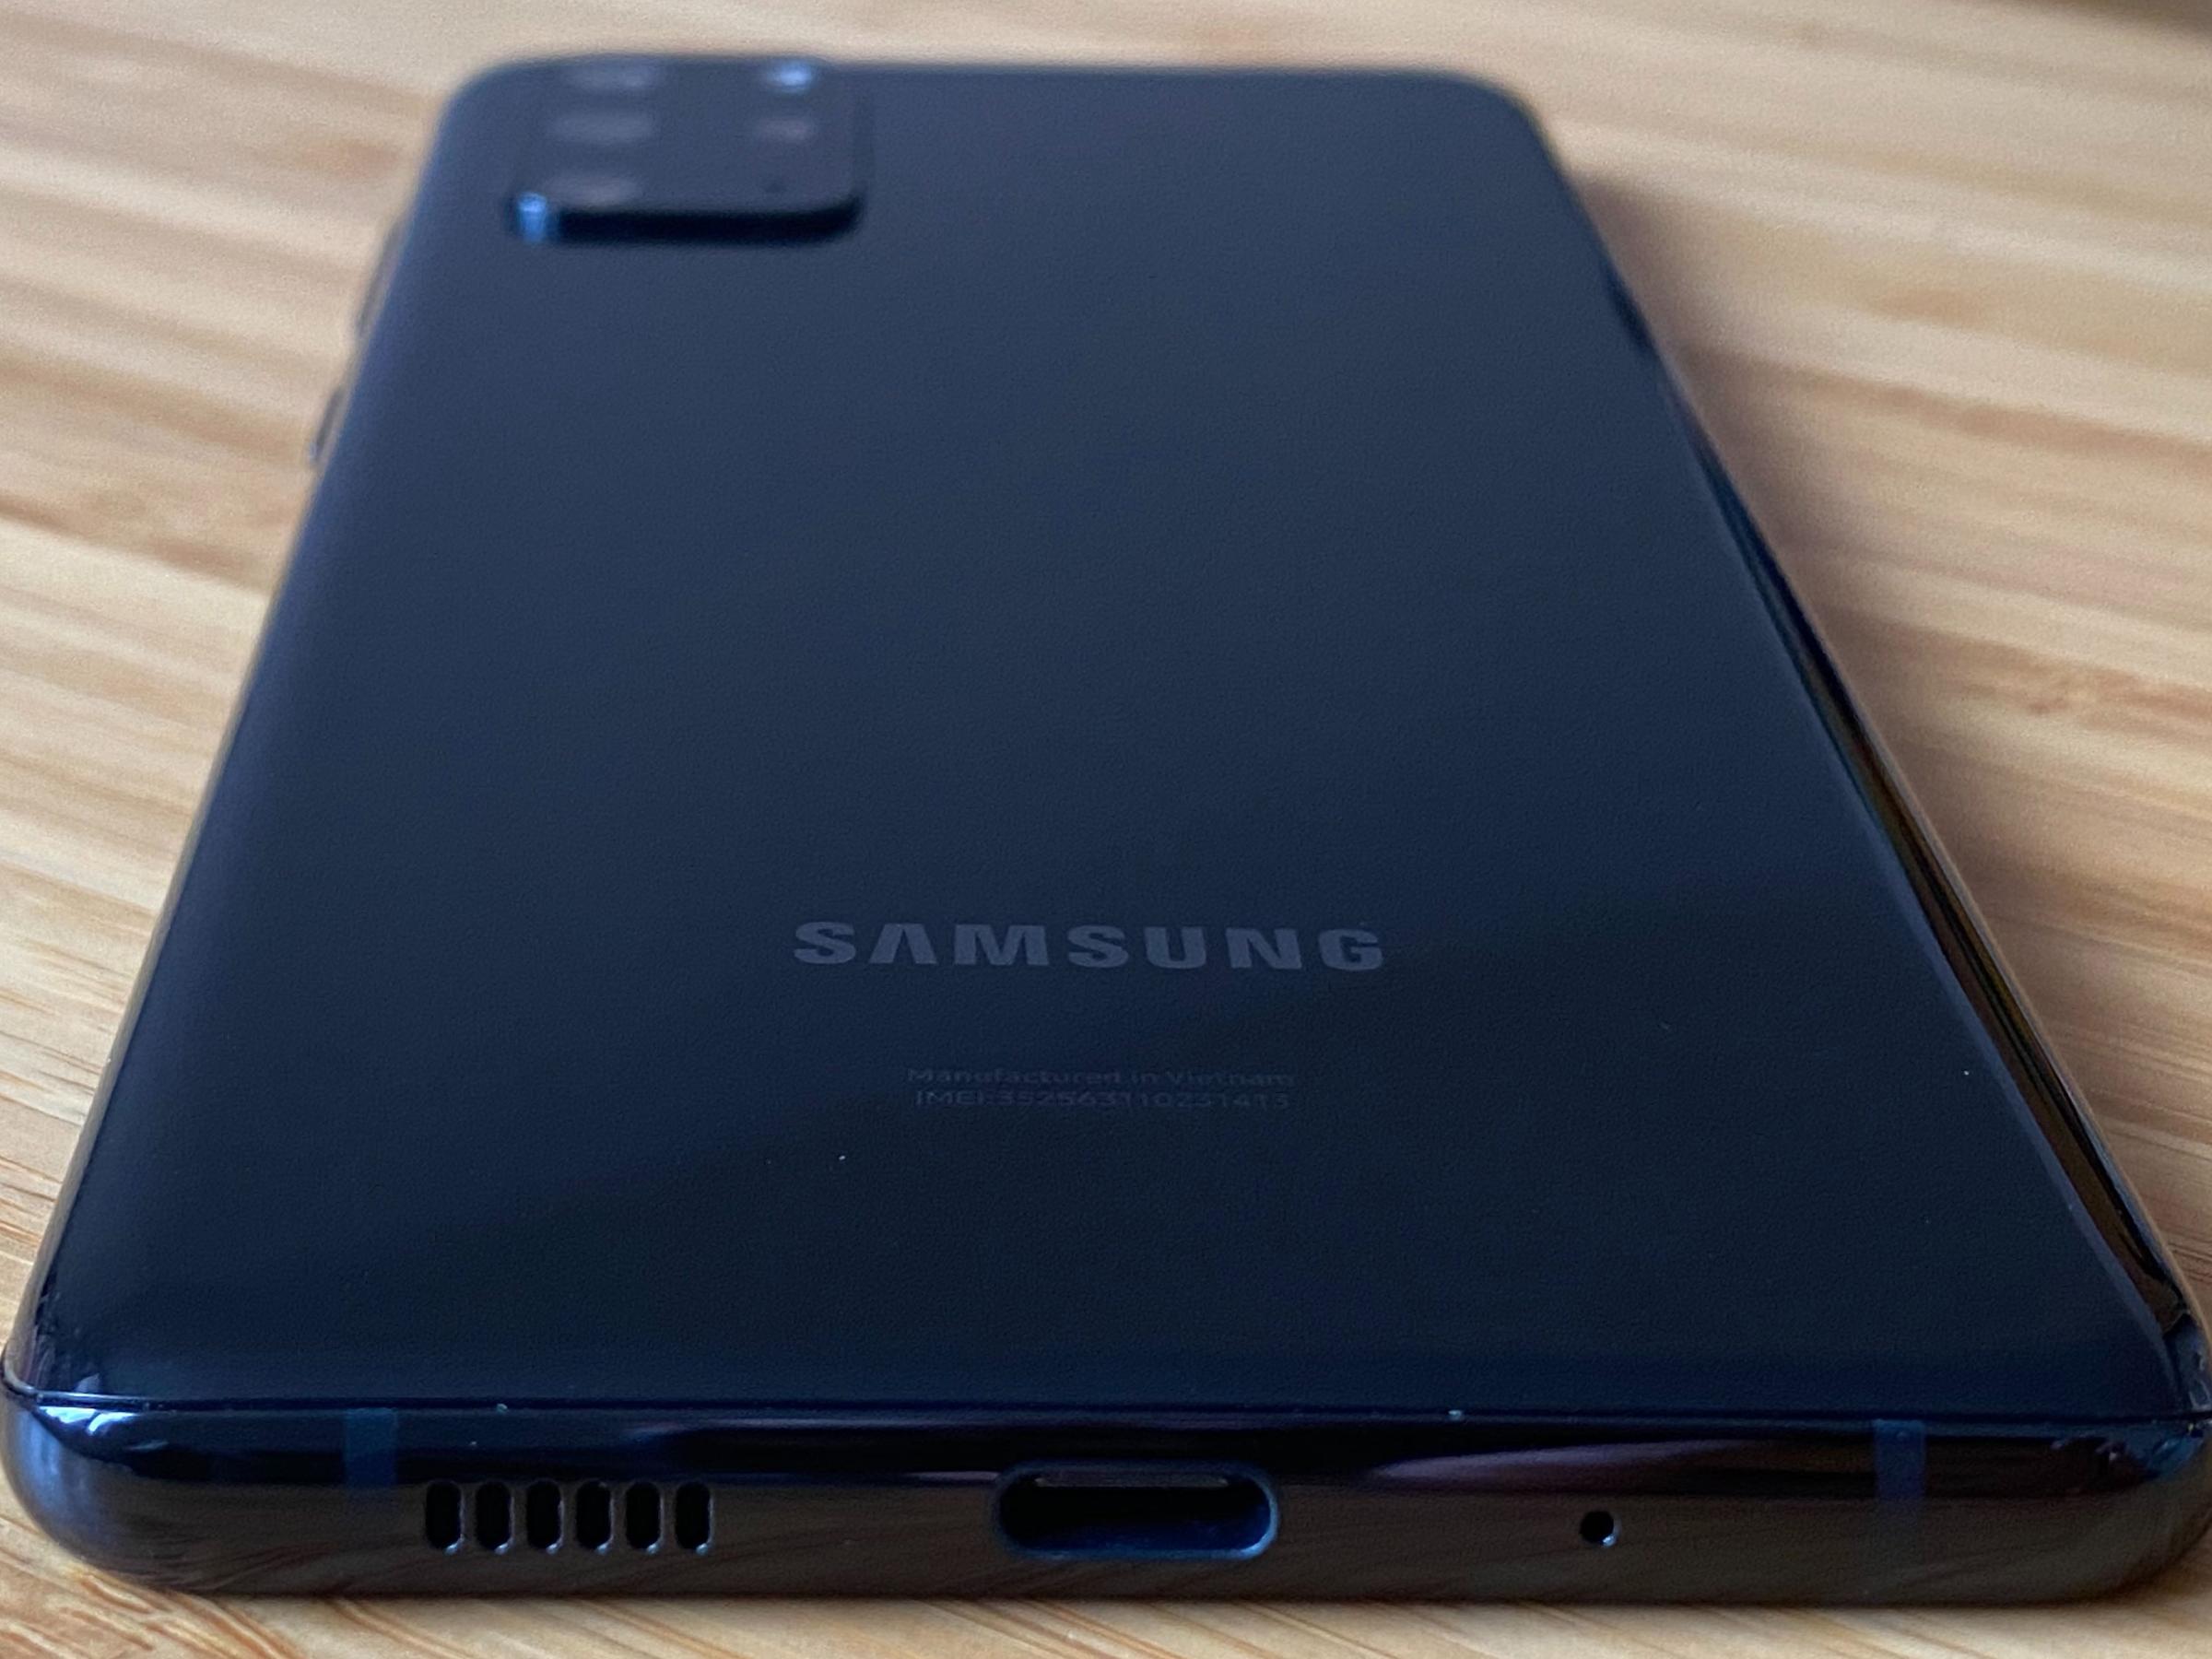 Galaxy S20 plus ports